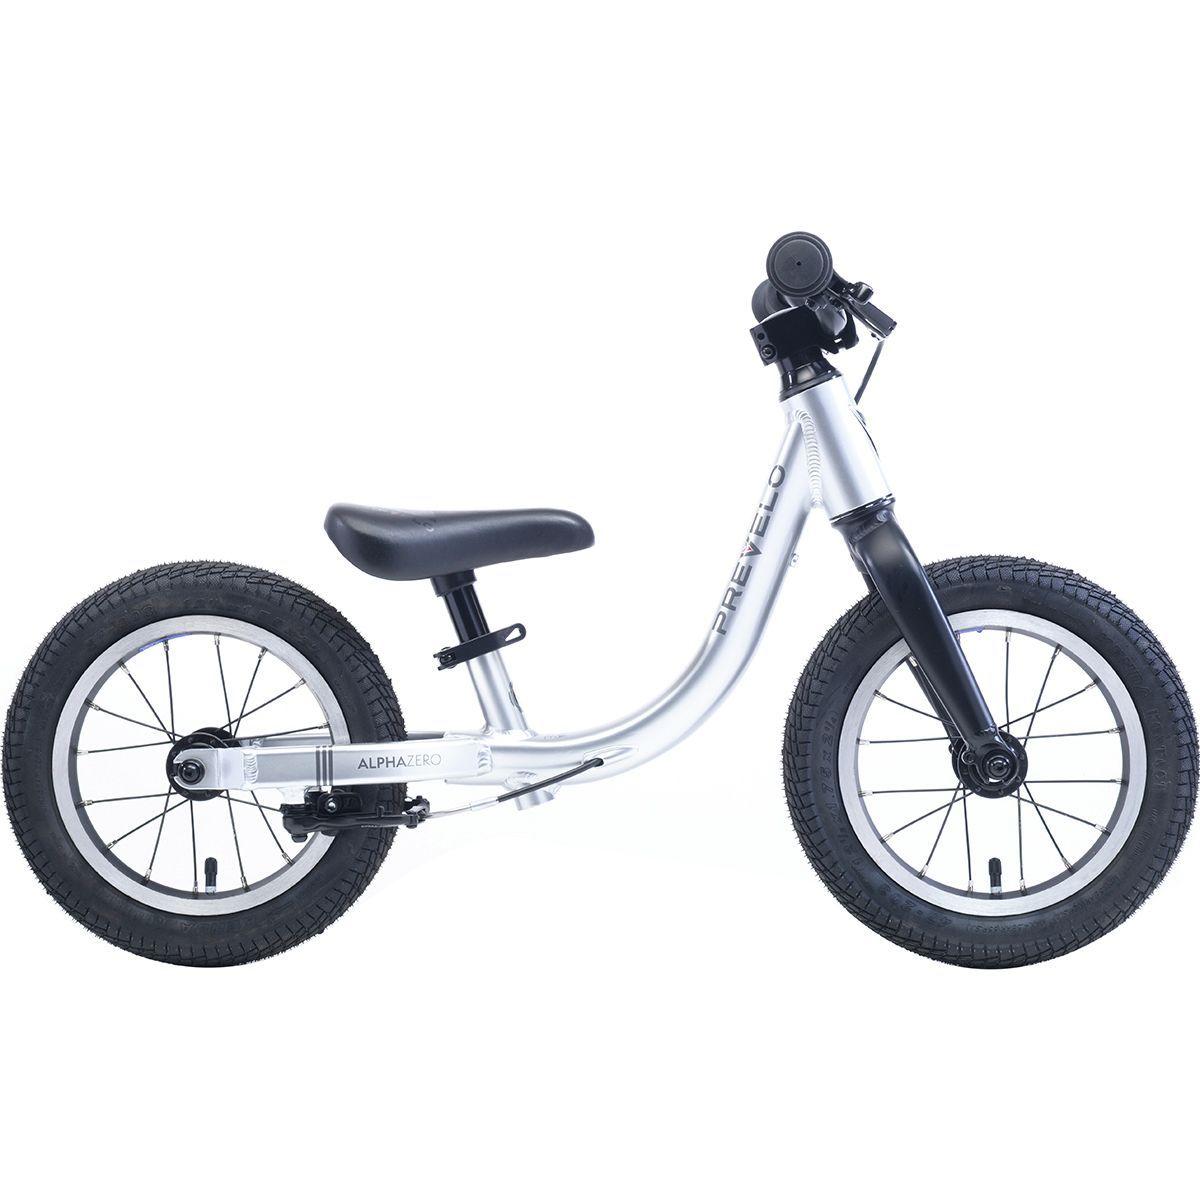 NEW Bike Bicycle Beach Cruiser Bike Bicycle Foam Grips Black 4 piece set